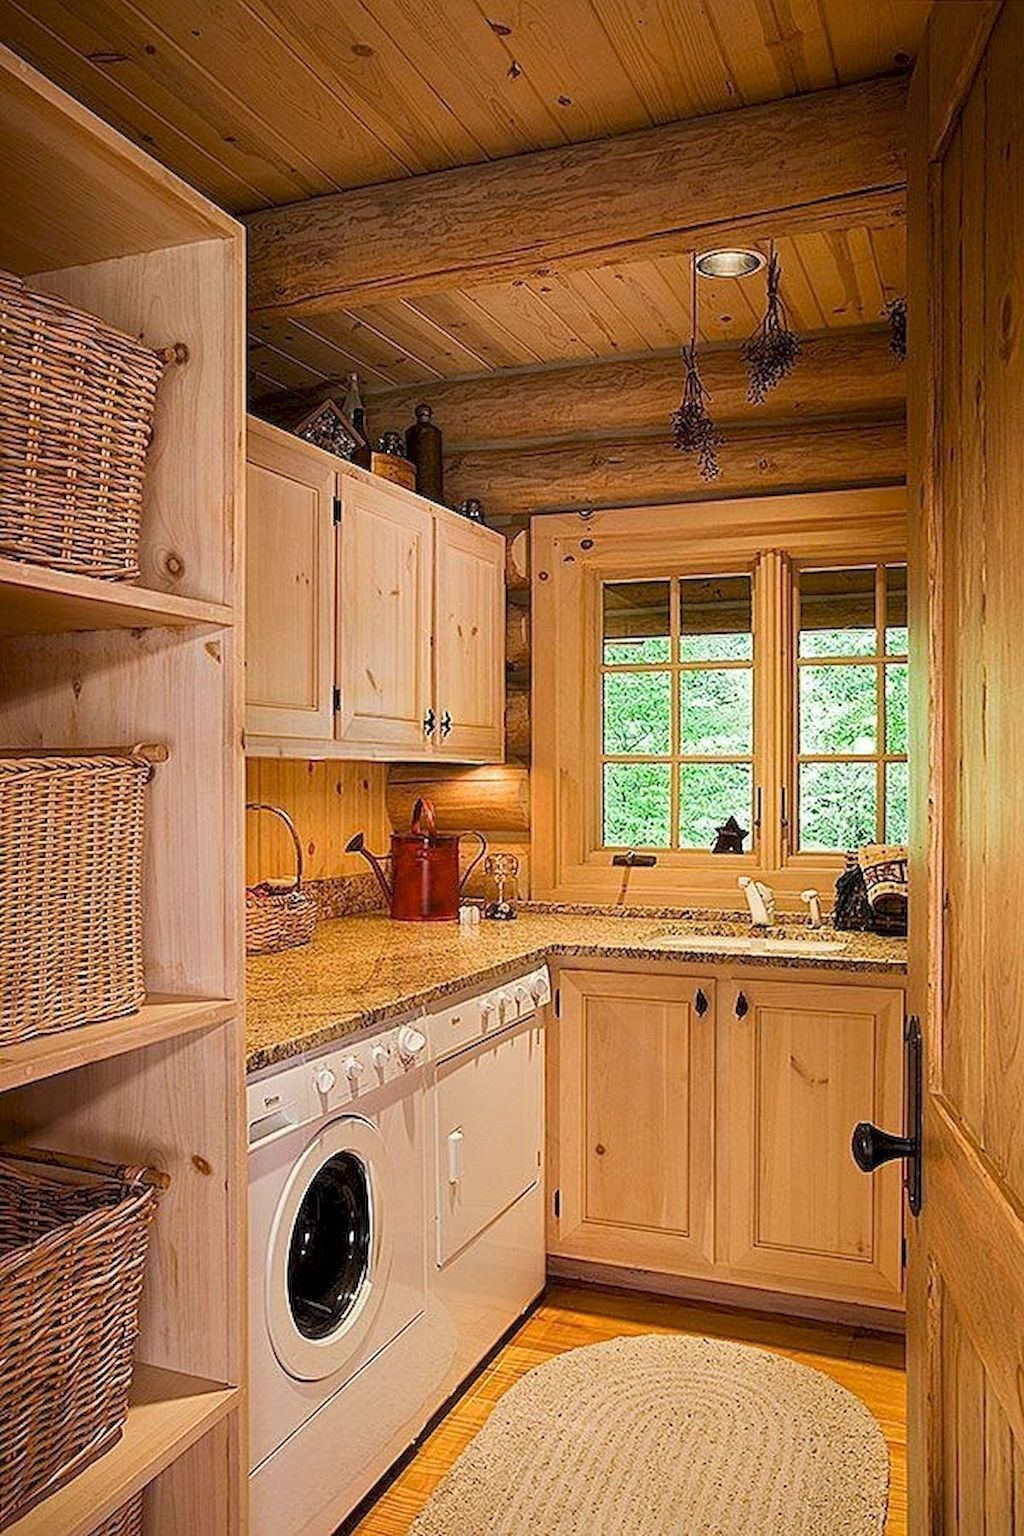 Amazing Farmhouse Laundry Room Decor Ideas 17 | Rustic ... on Amazing Laundry Rooms  id=24555